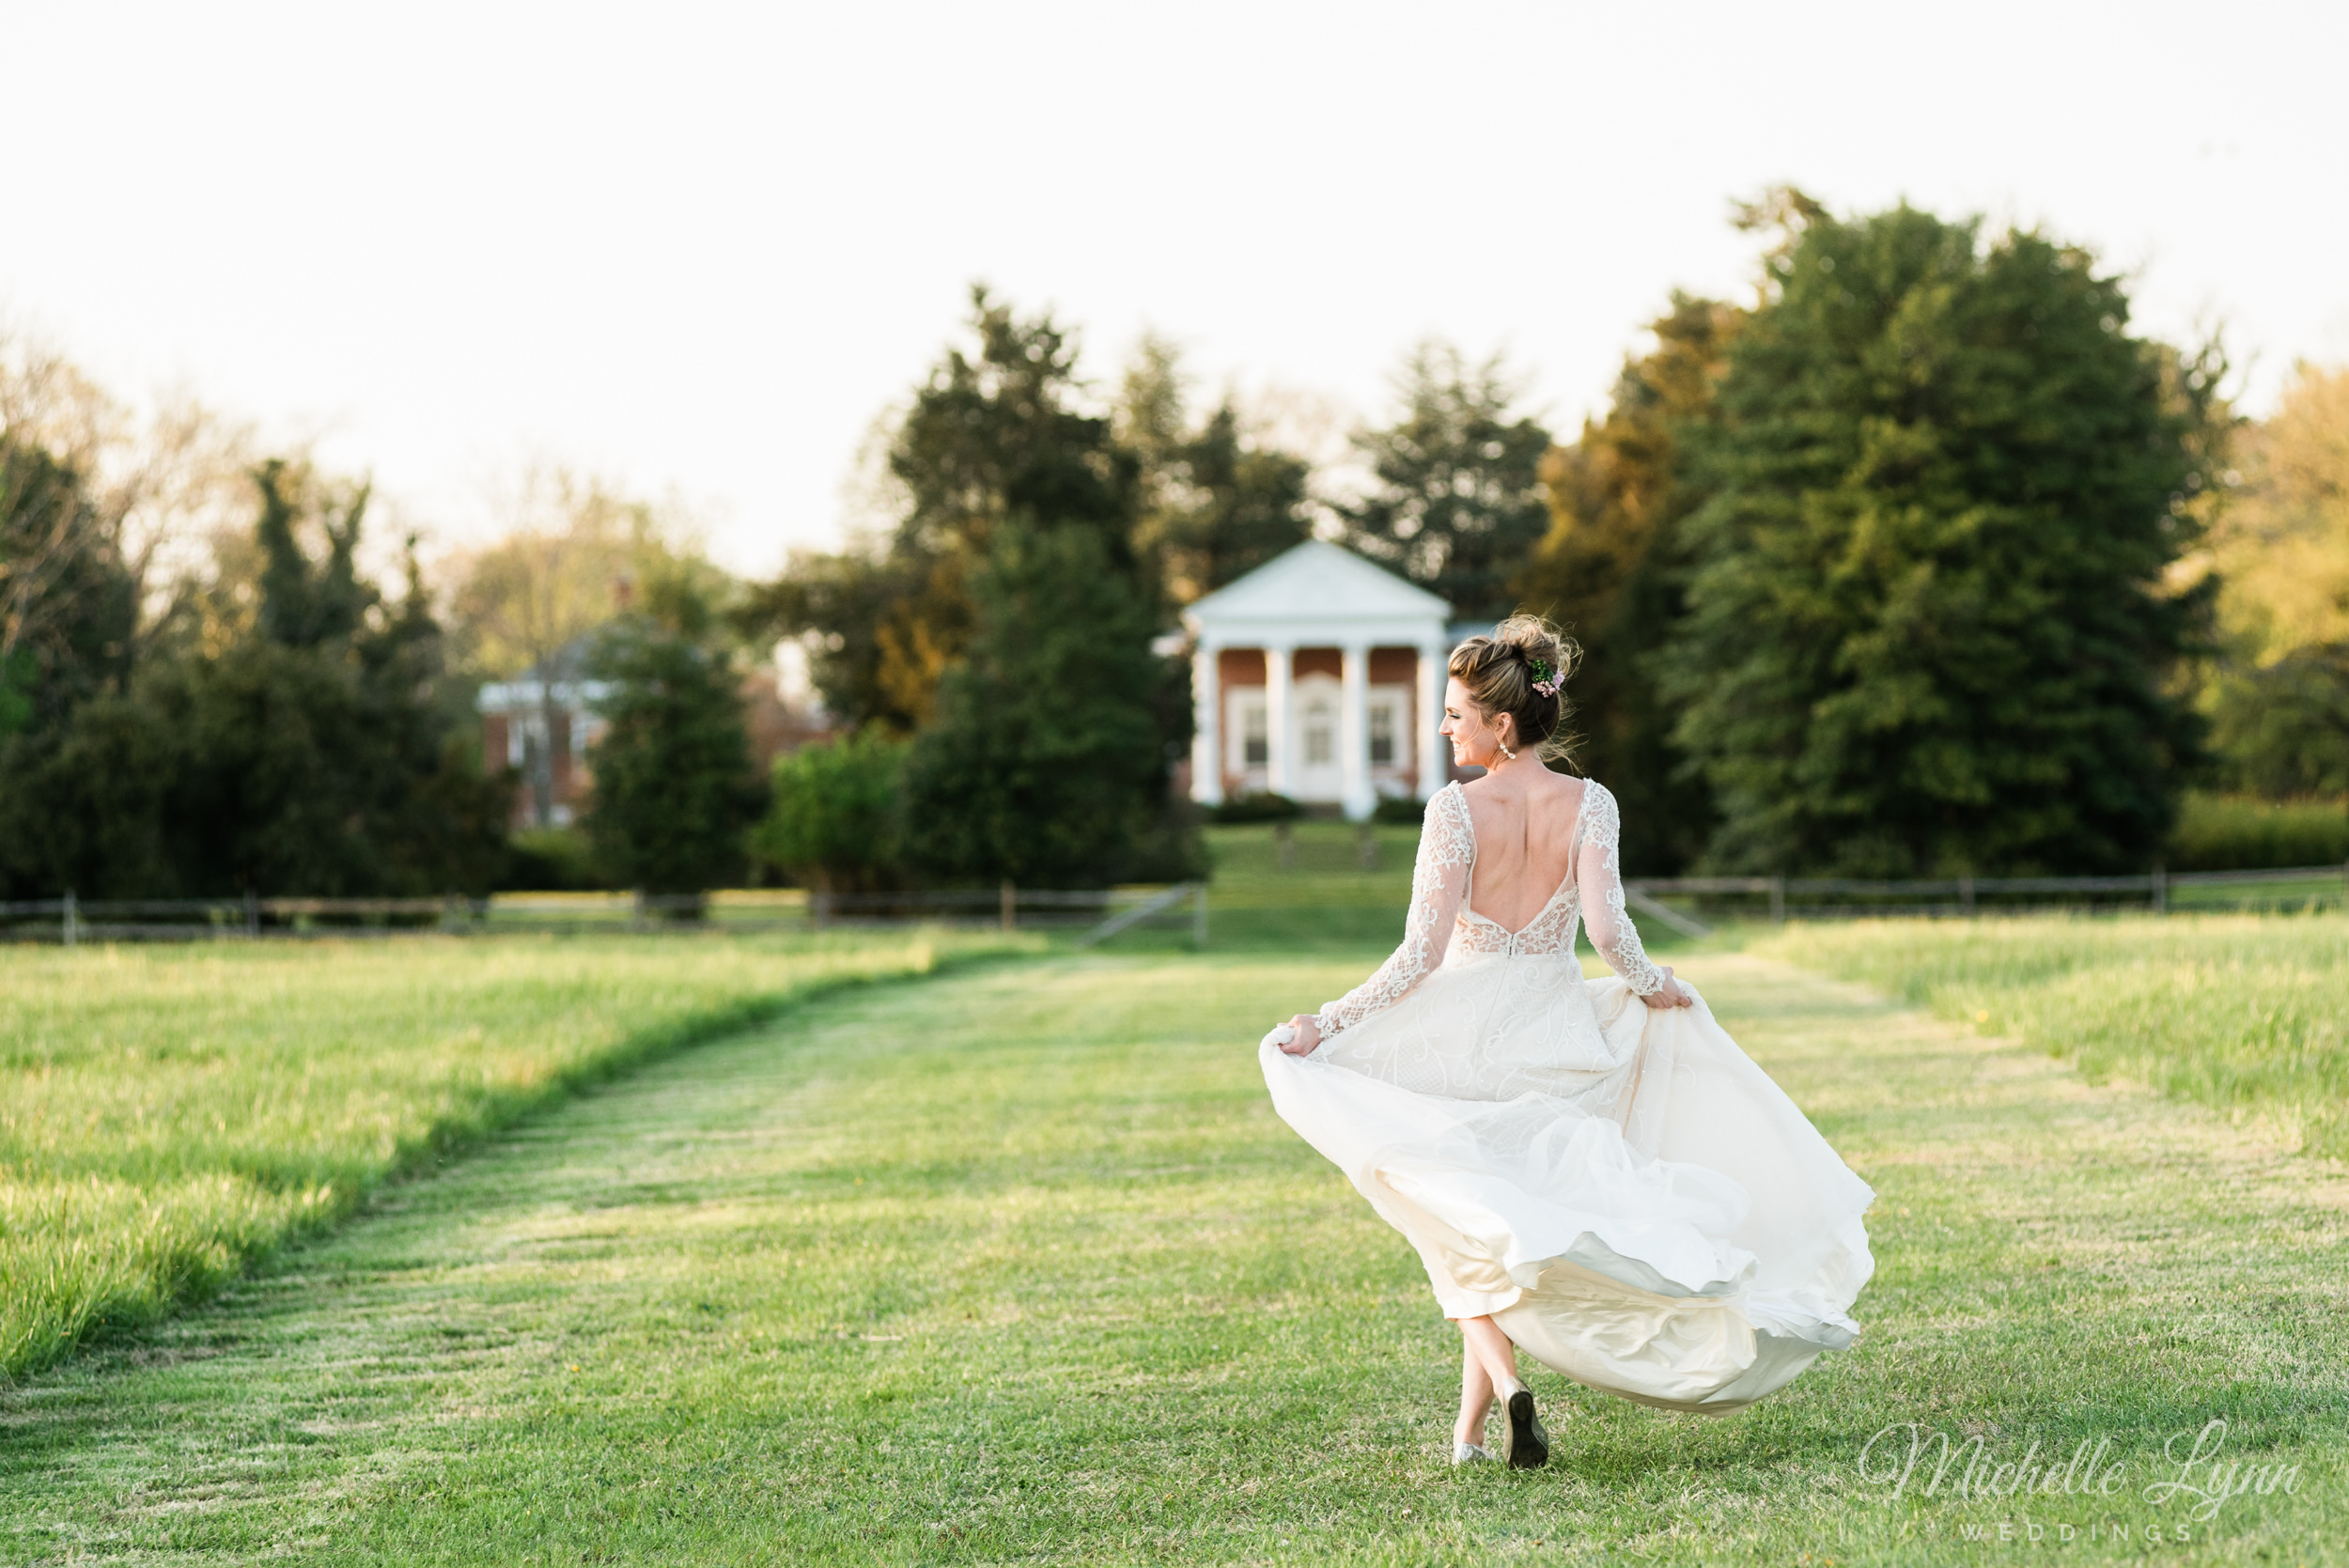 mlw-whitehall-annapolis-wedding-photography-20.jpg